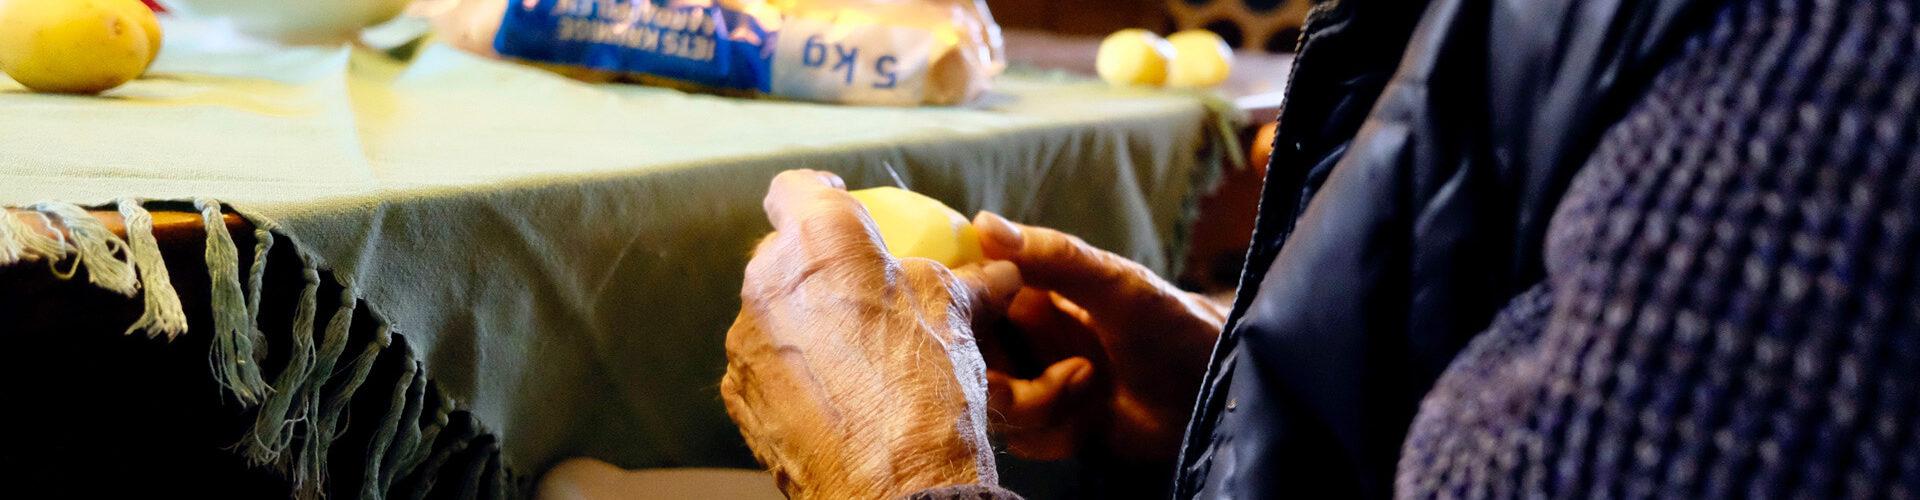 hands pealing potatoes